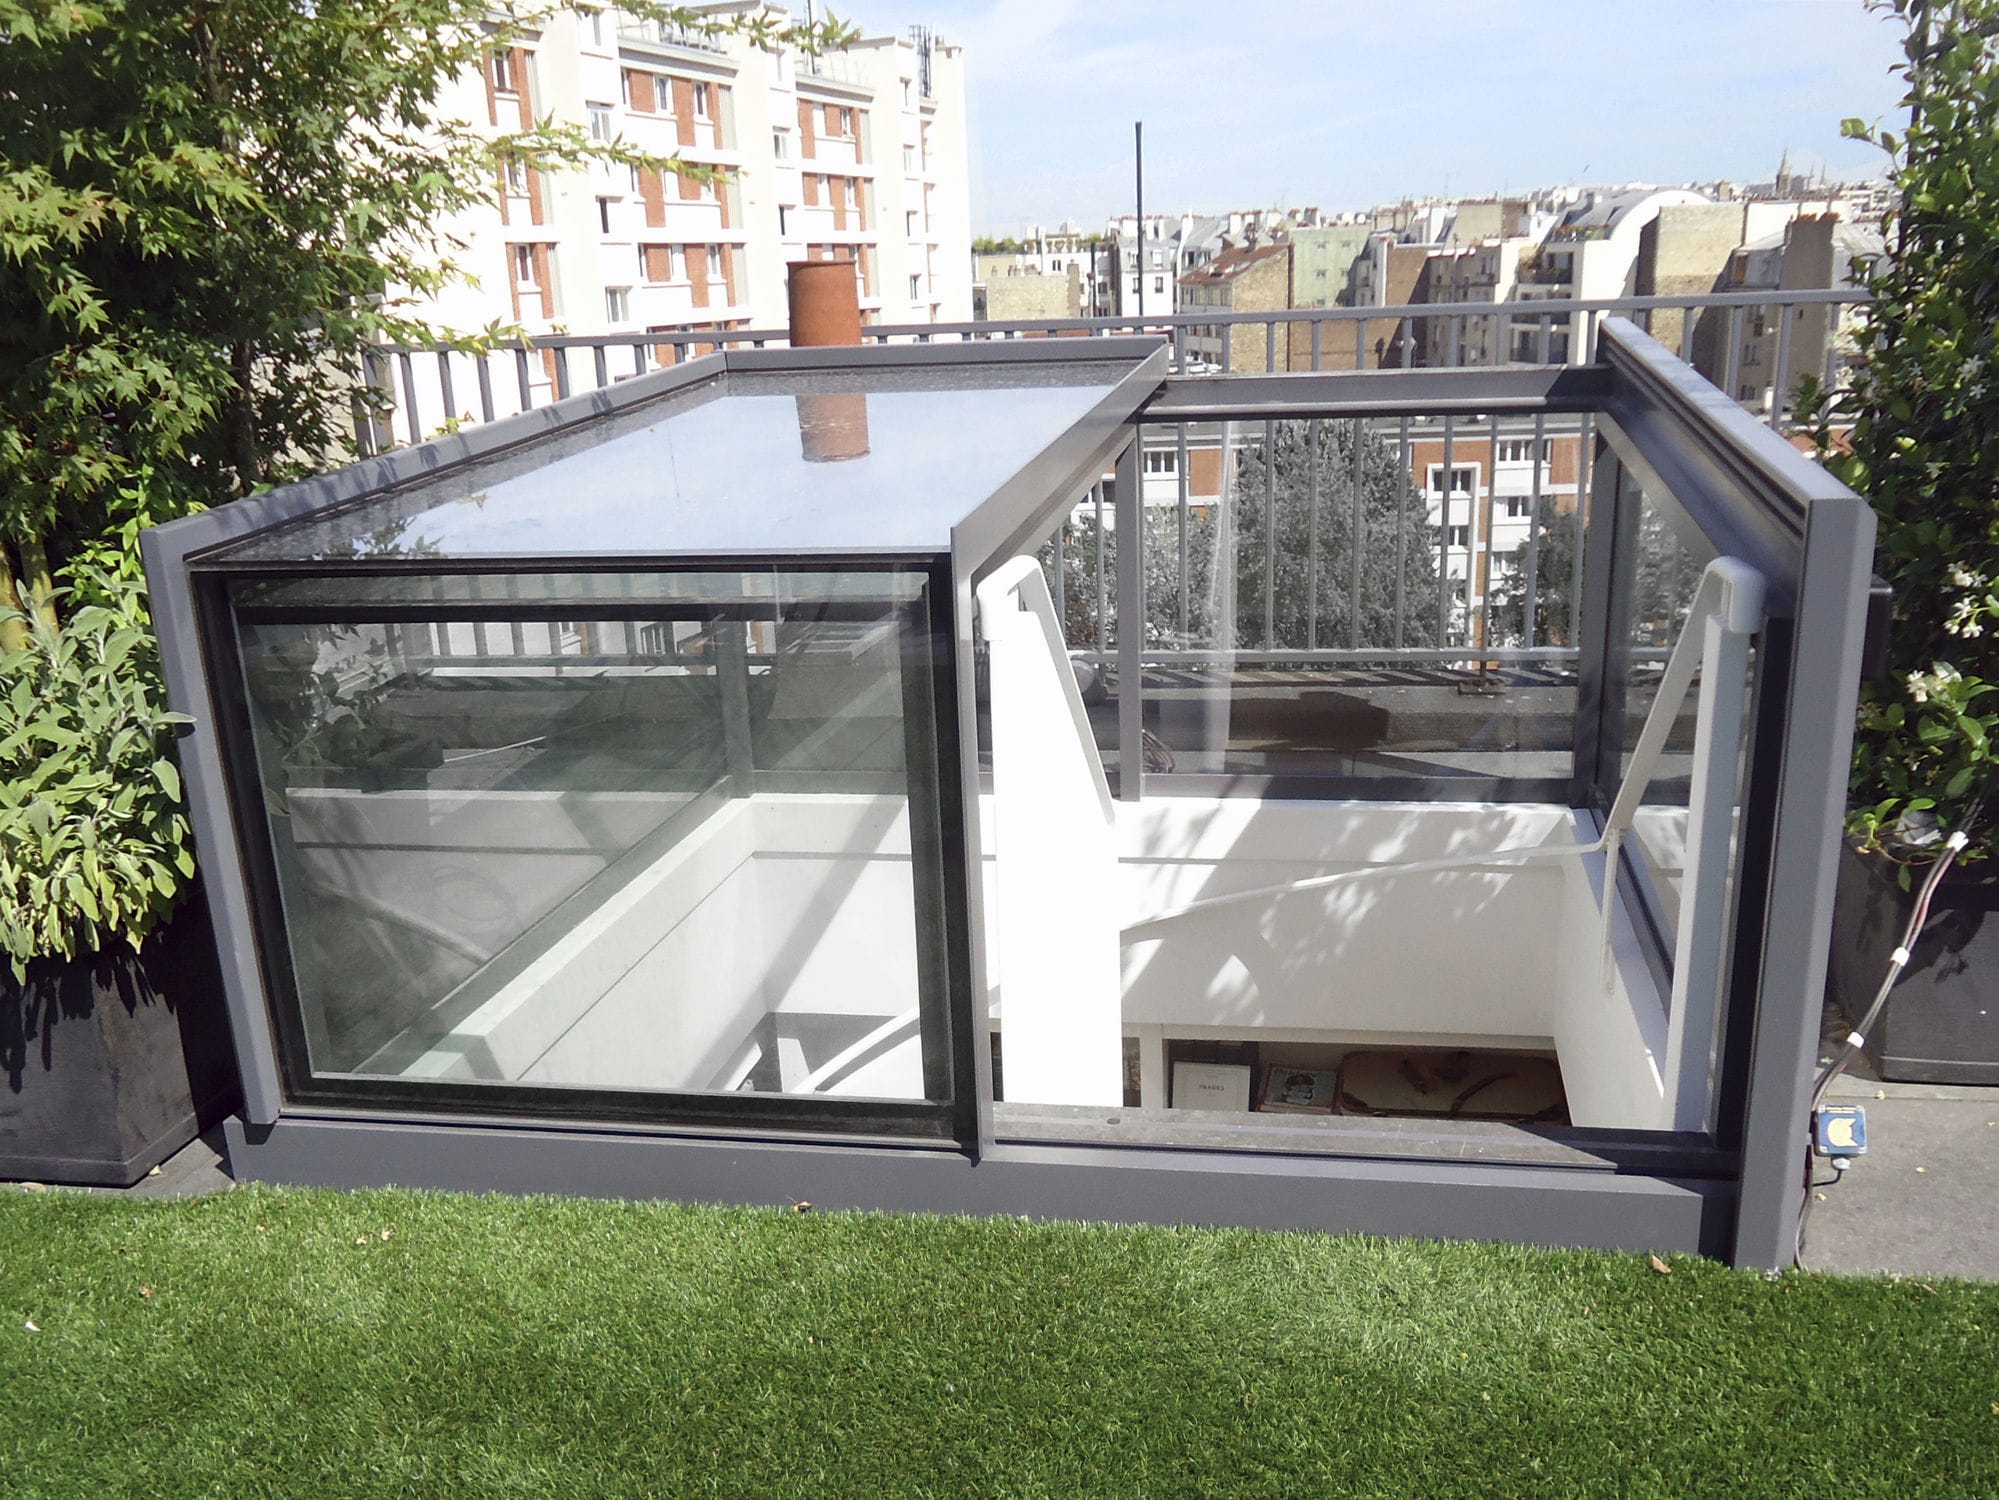 Picture of: Trappe D Acces Au Toit Gv Freestanding Sliding Box Glazing Vision Rectangulaire En Metal Vitree